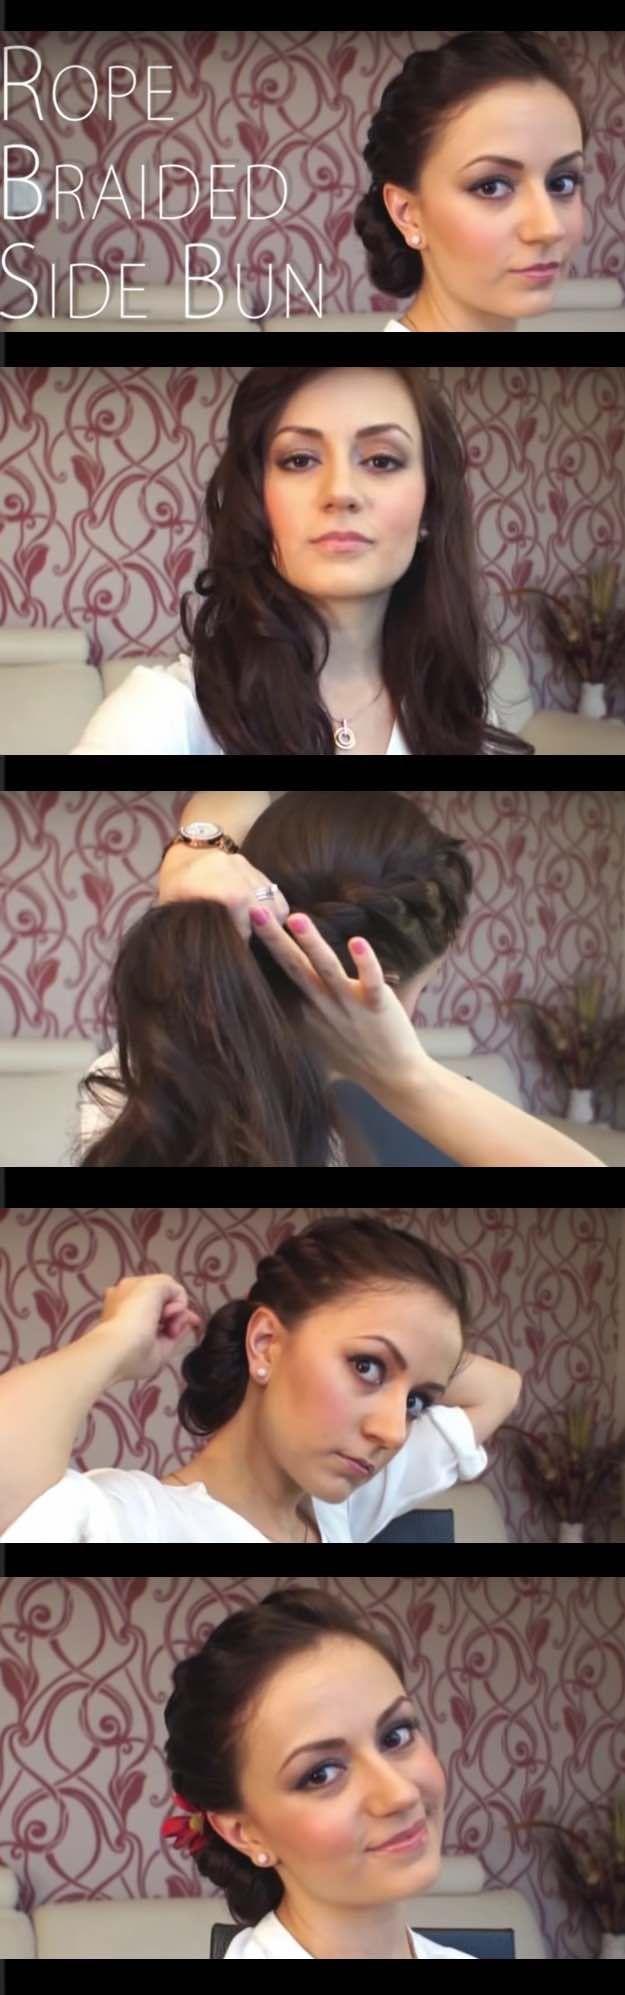 Best Hair Braiding Tutorials - Rope Braided Side Bun - Step By Step Easy Hair Br...